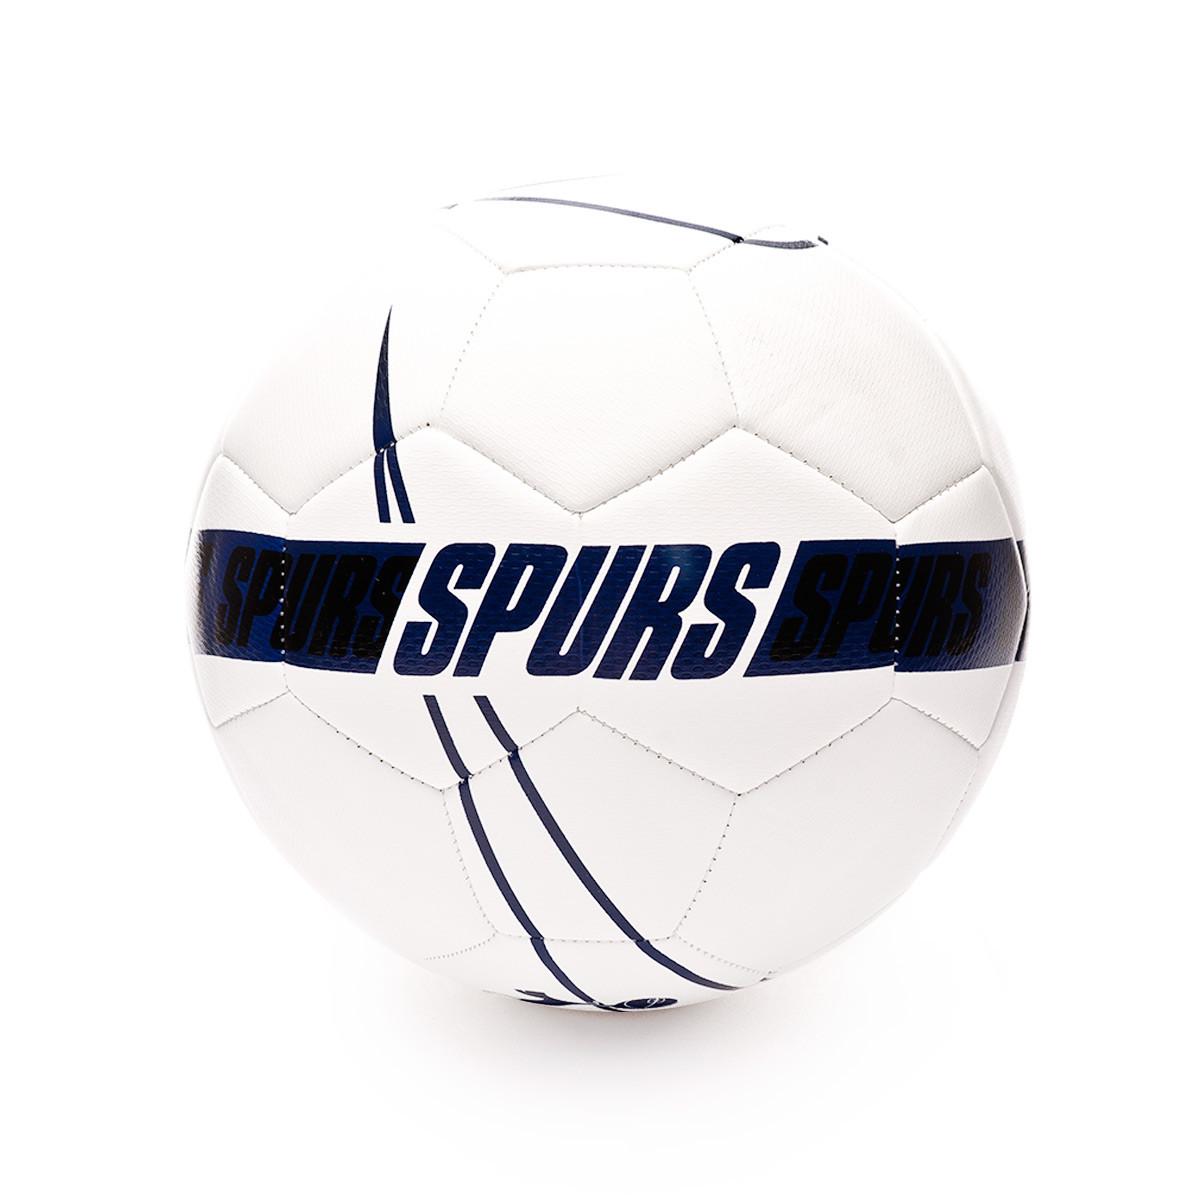 the best attitude 0fd73 94d23 Balón Tottenham Hotspur Prestige 2019-2020 White-Black-Binary blue